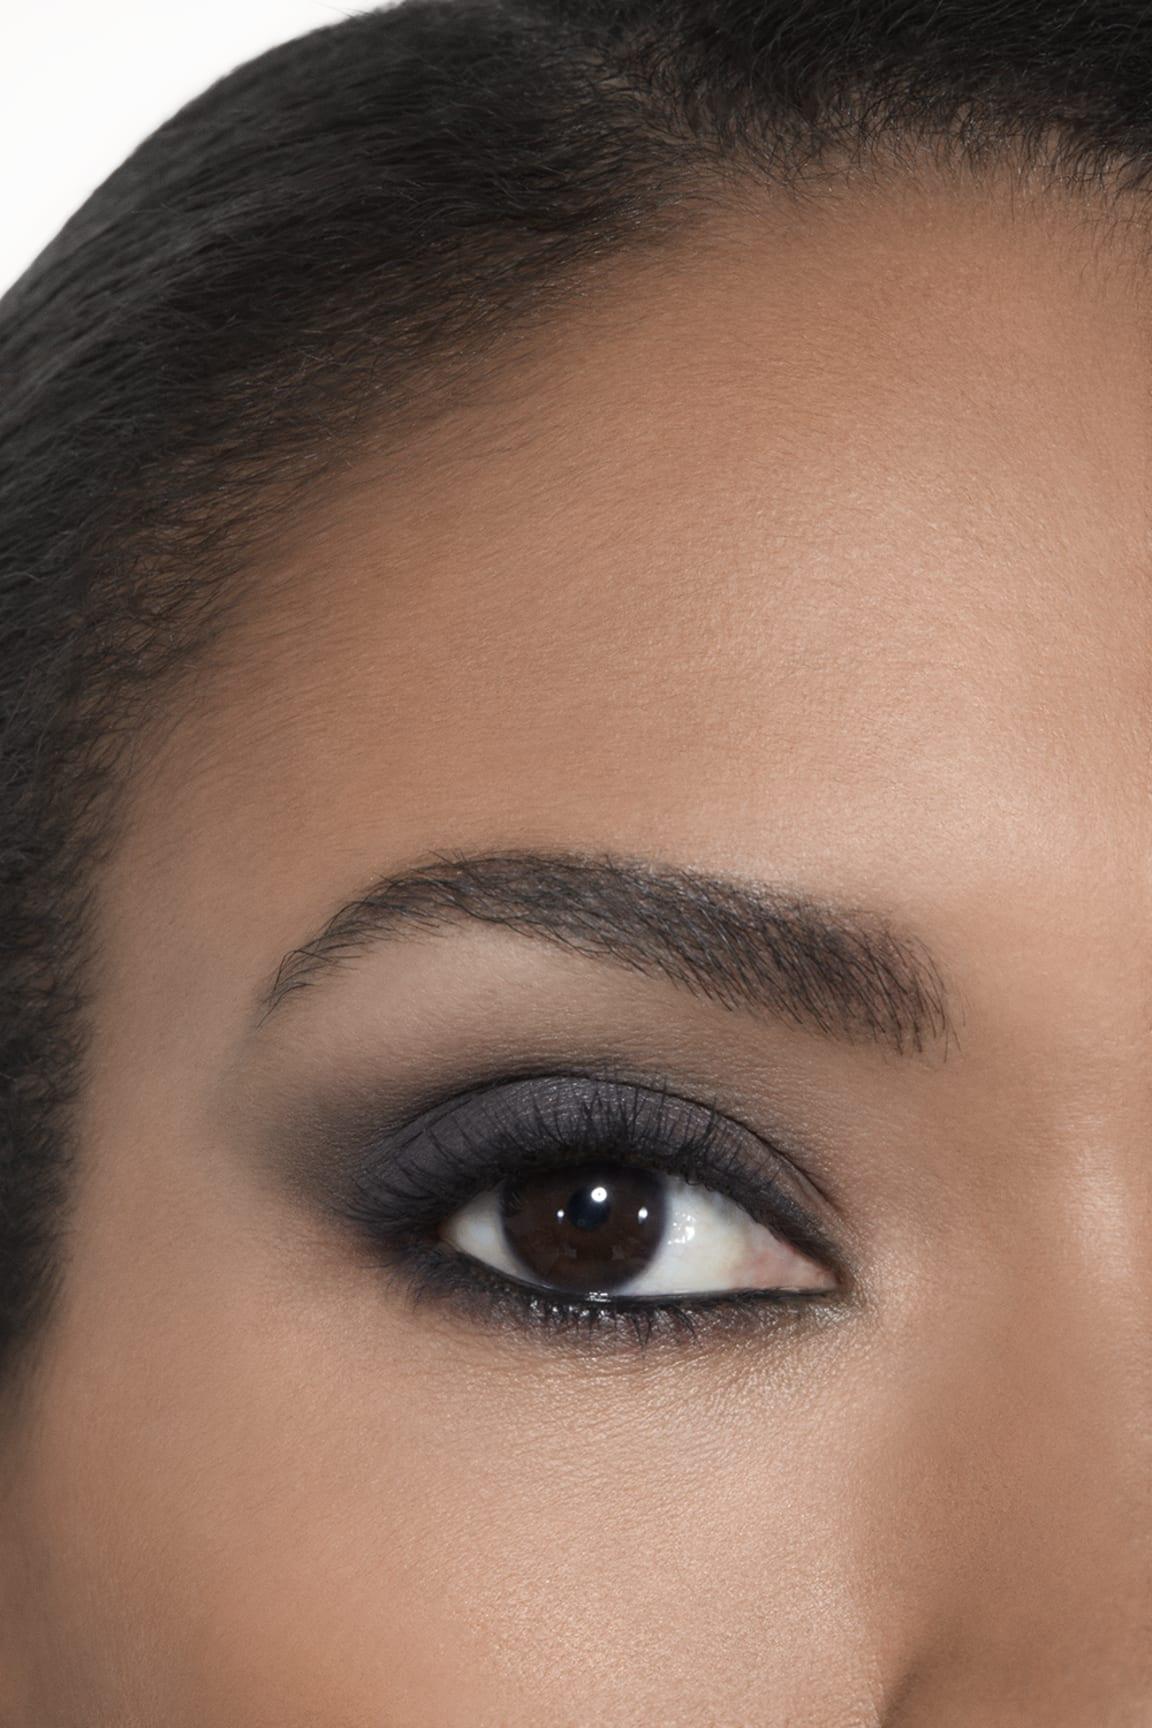 Application makeup visual 2 - LES BEIGES EYESHADOW PALETTE MEDIUM